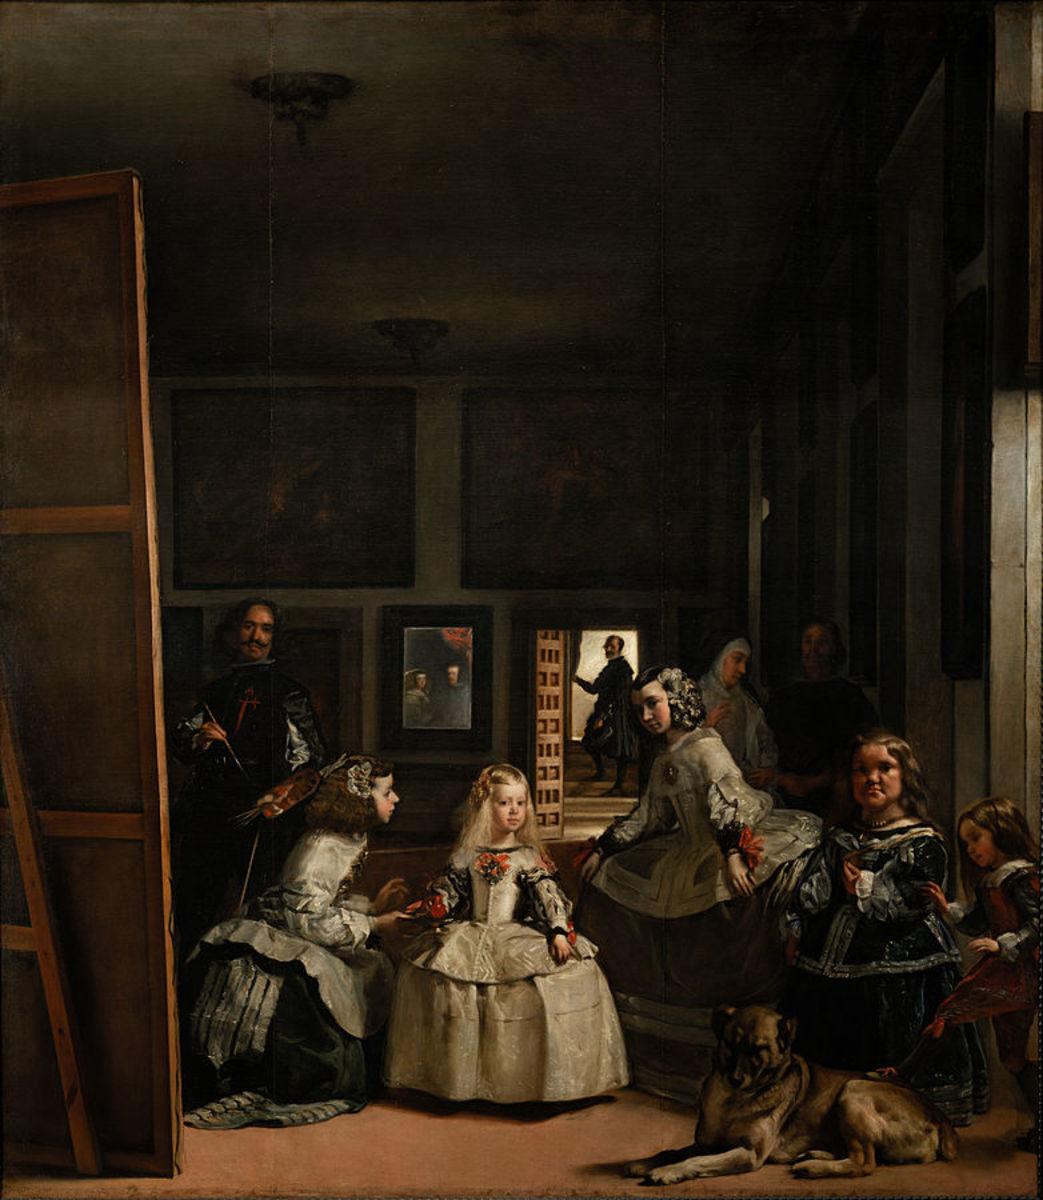 Las Meninas, 1656-57, by Velazquez (Prado Museum)